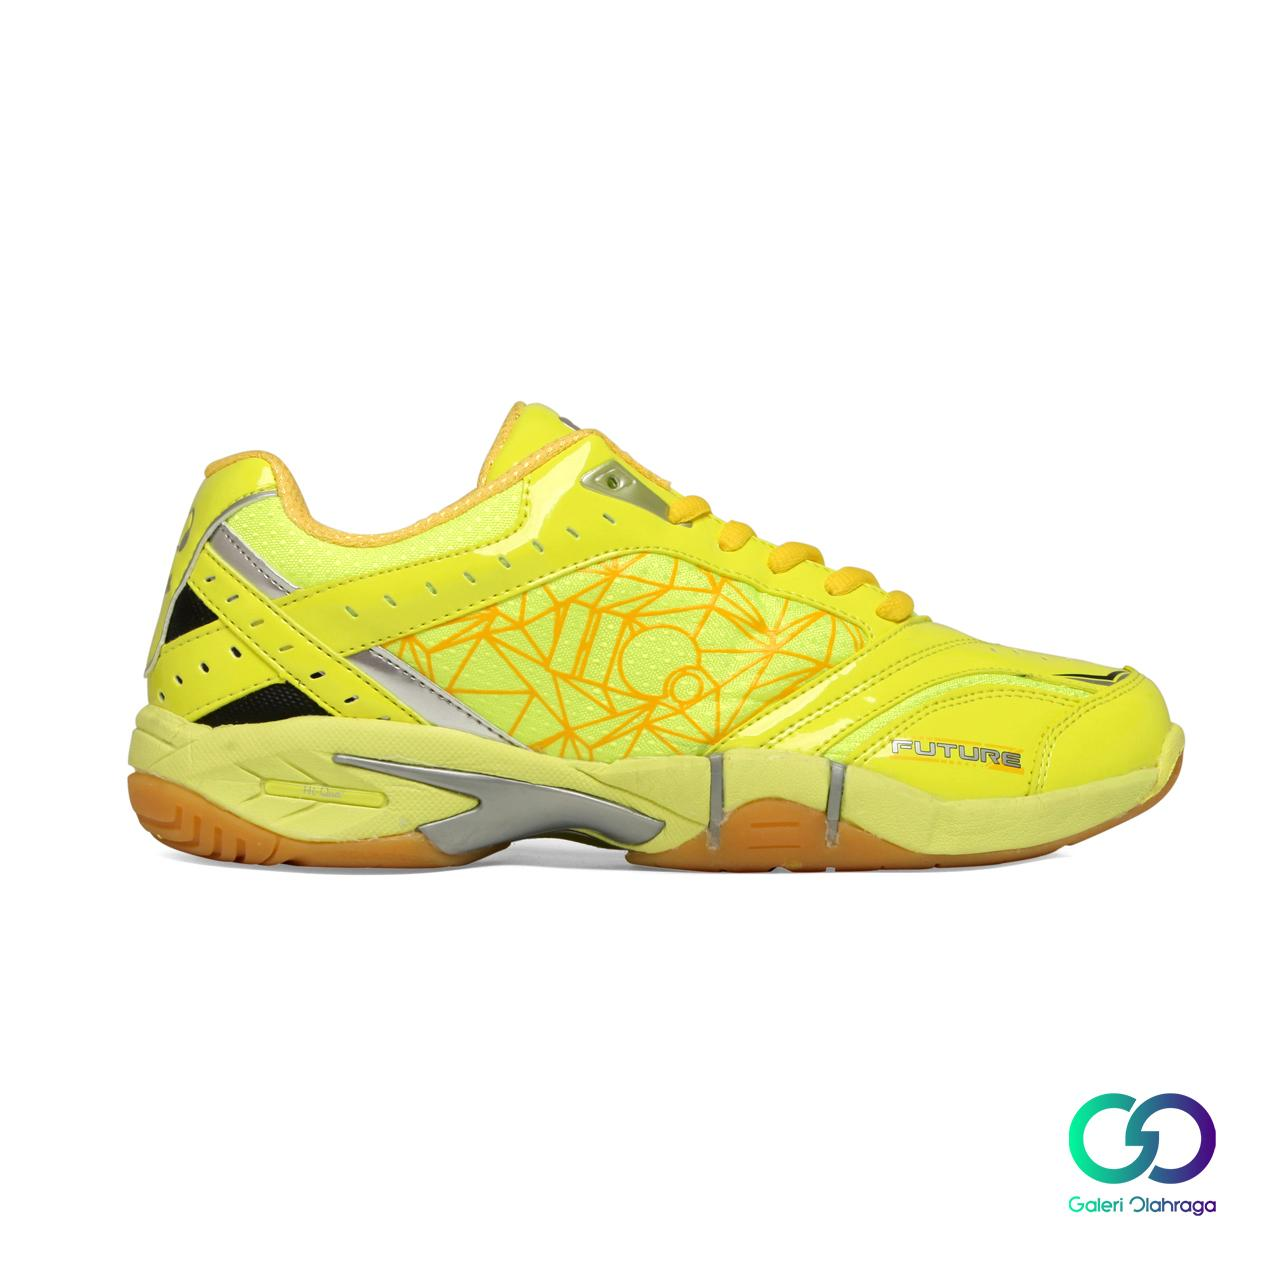 2018 New Arrival! Hi-Qua Sepatu Bulutangkis / Badminton / Olahraga Future Original Ringan